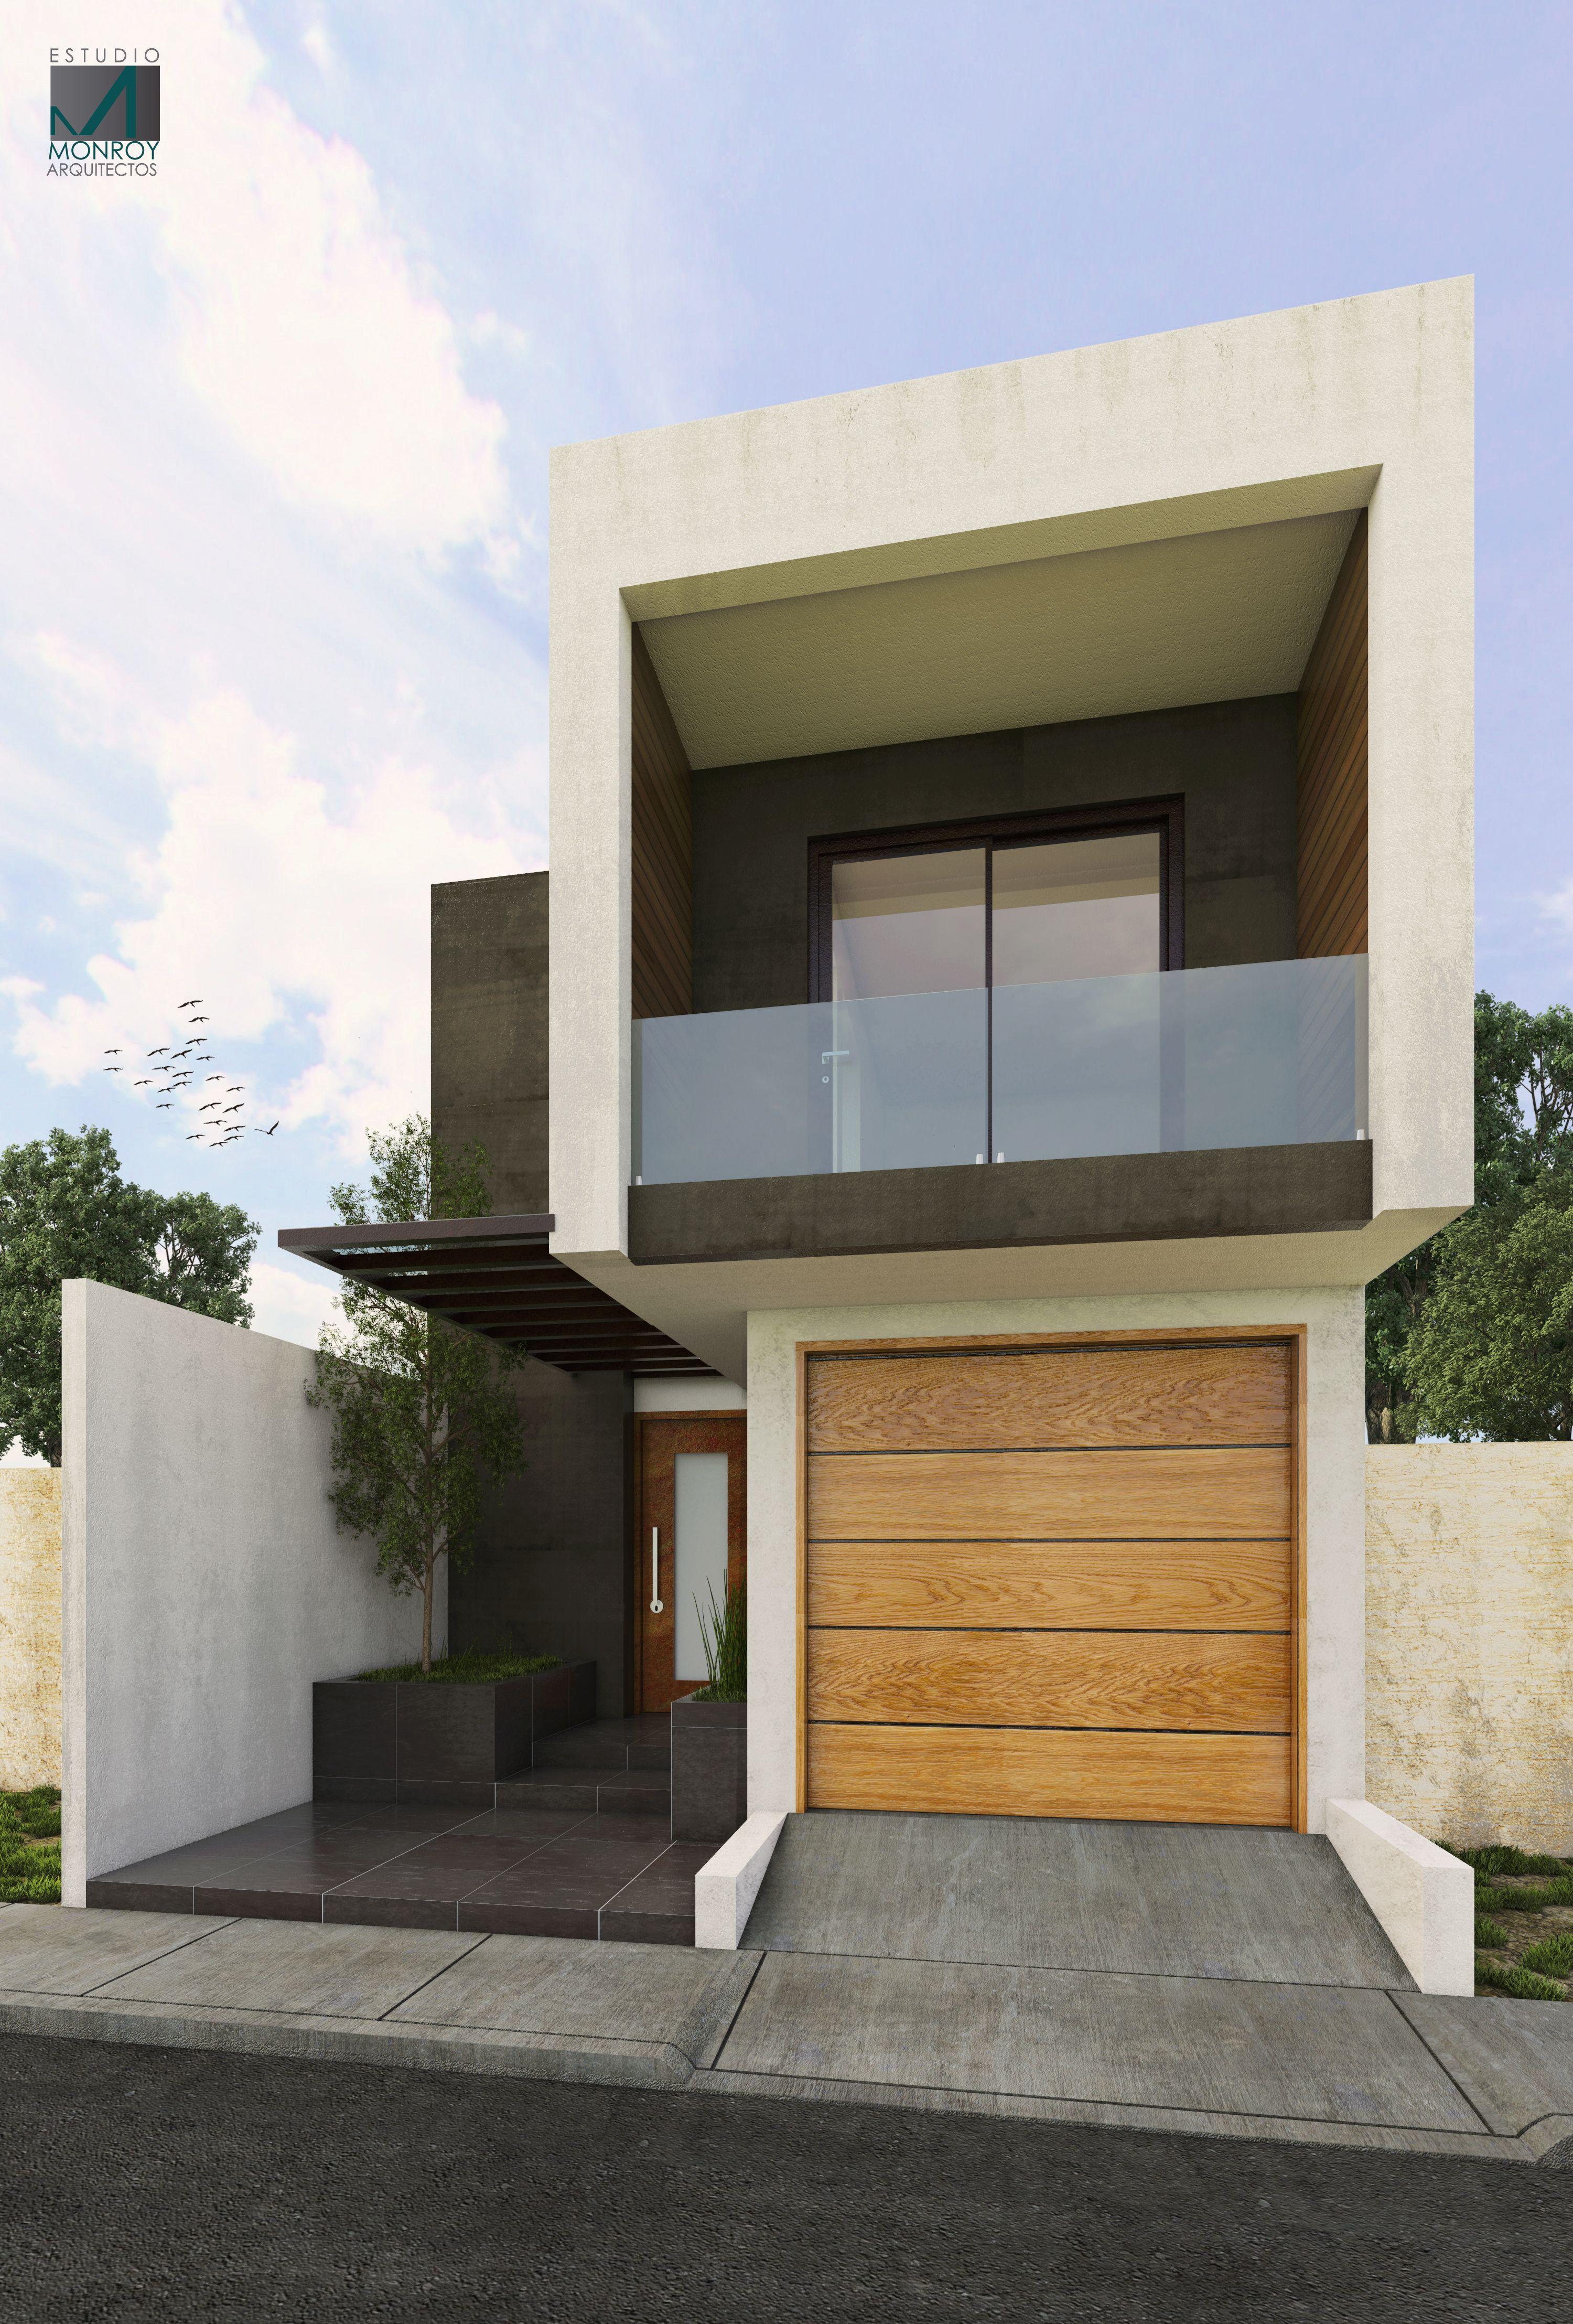 Remodelaci n fachada contempor nea 2 arquitecturamoderna for Remodelacion de casas pequenas